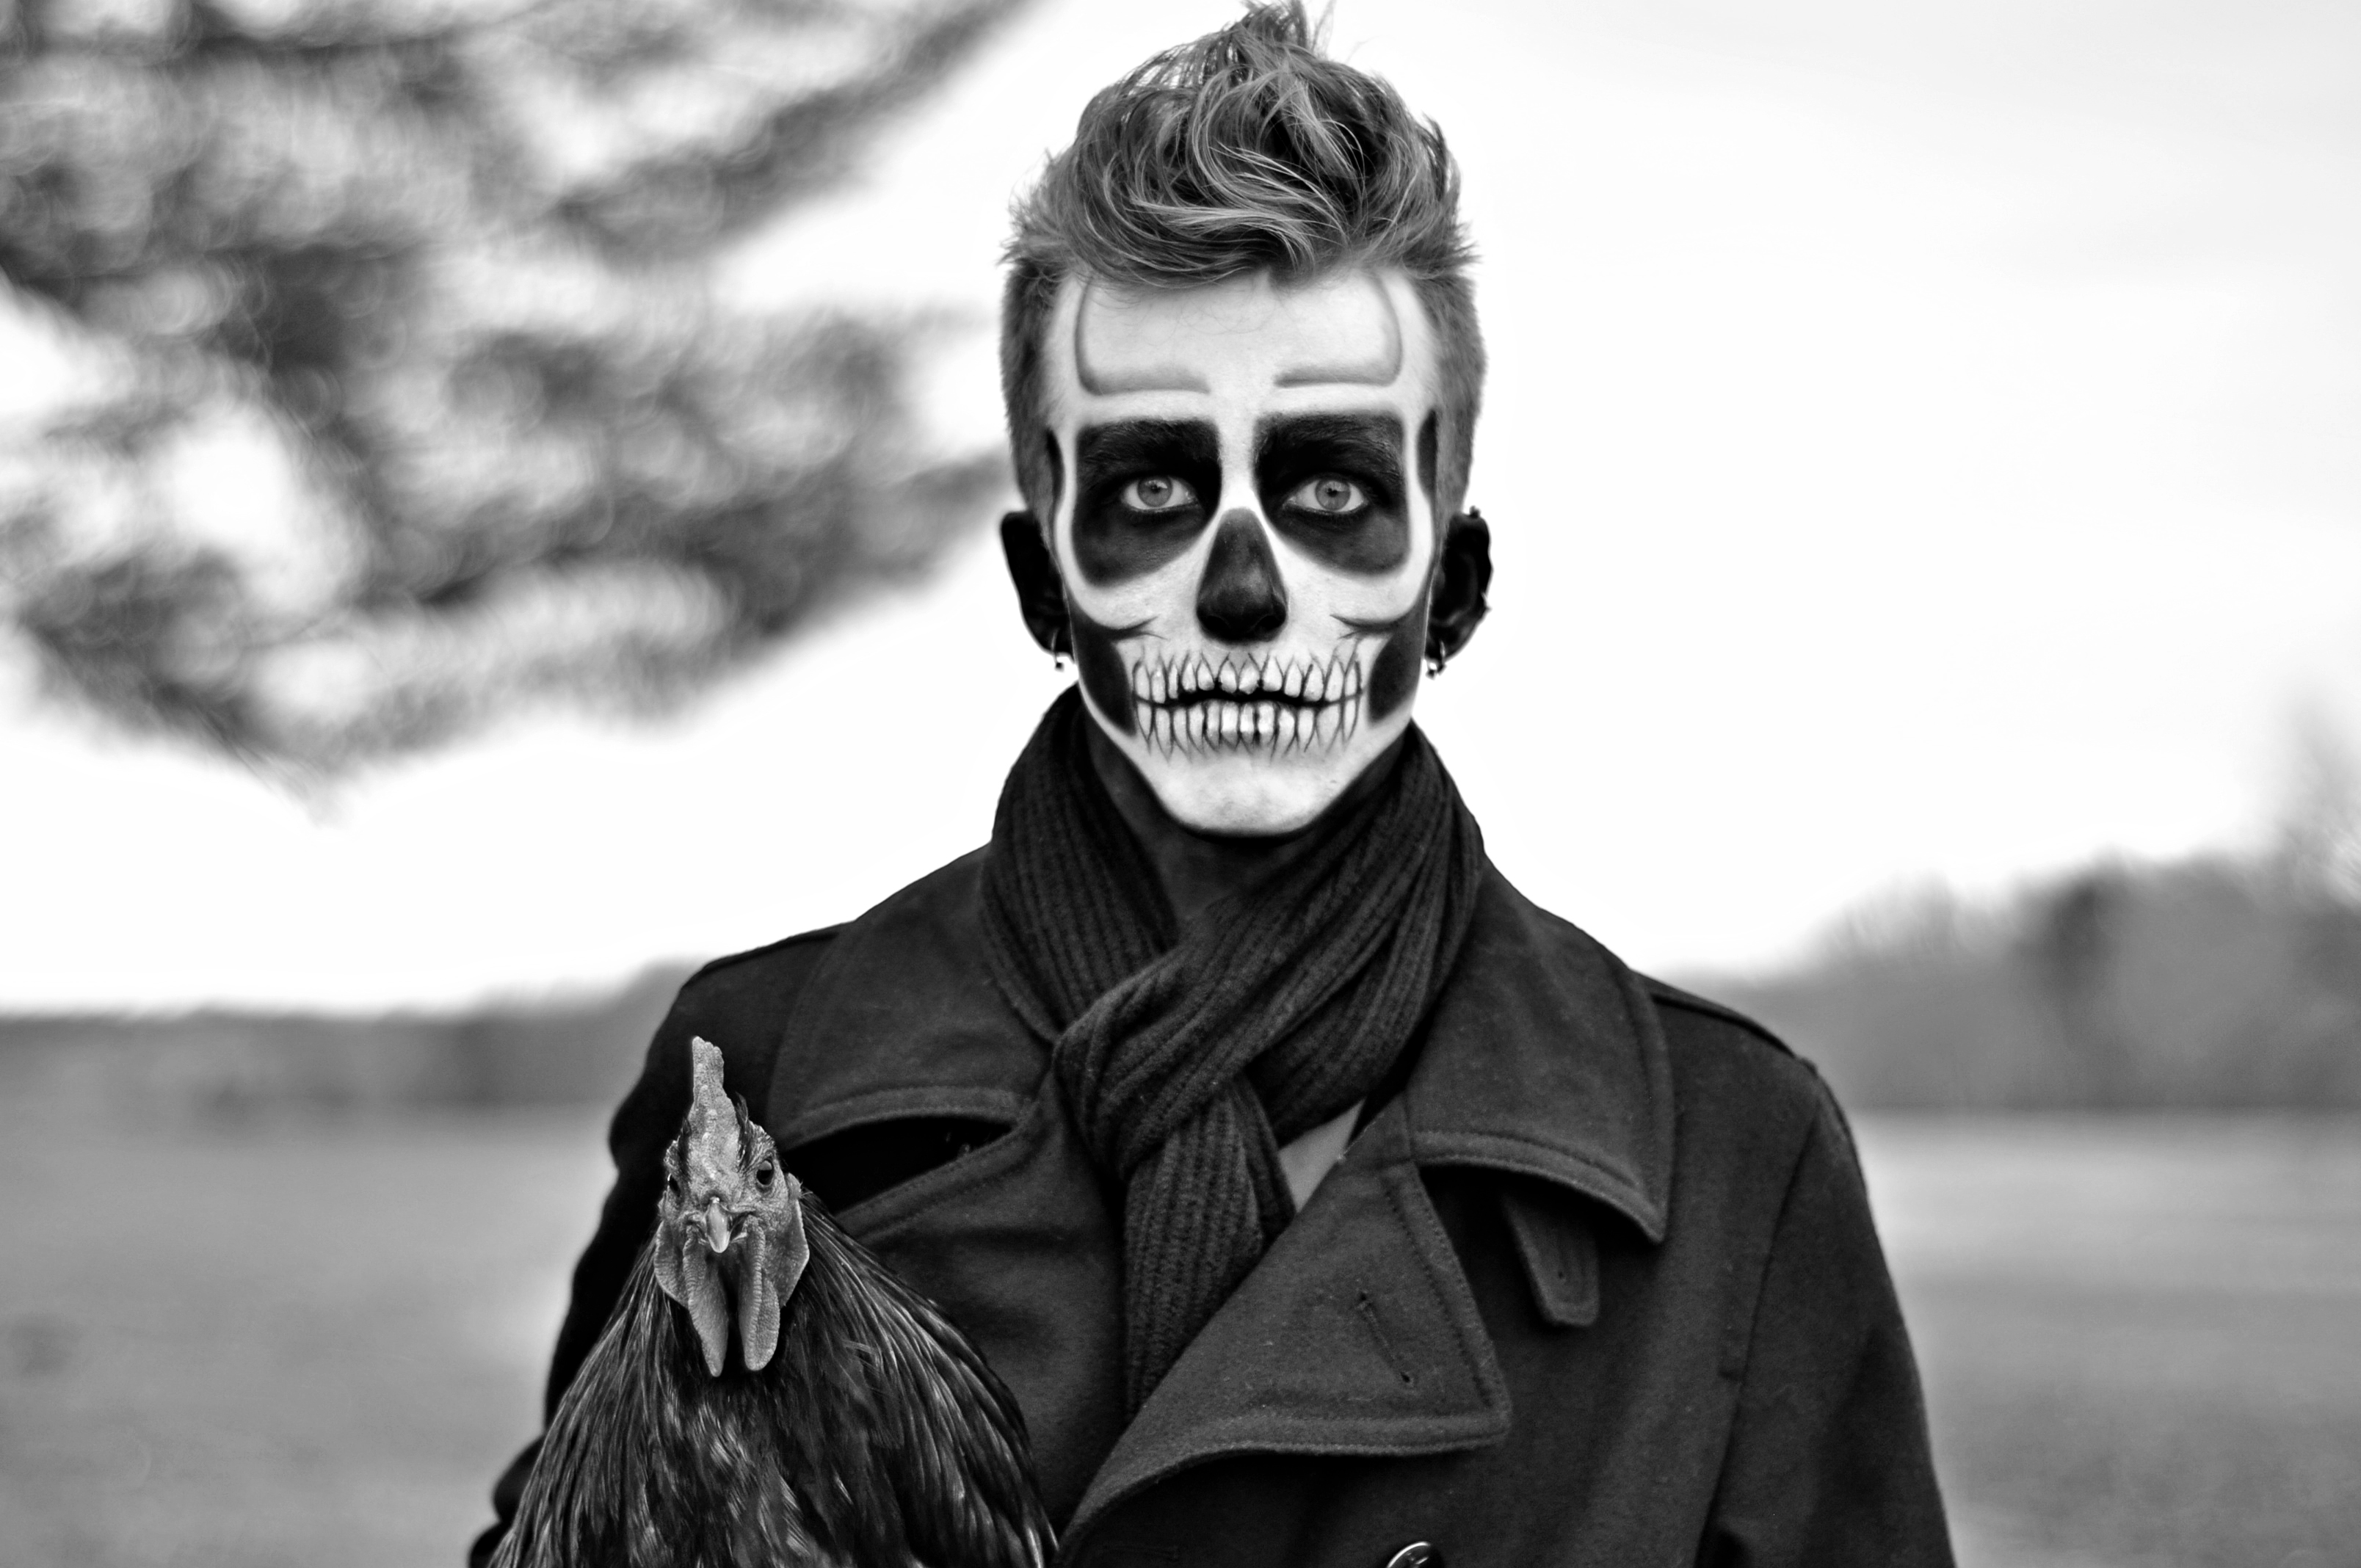 1d Niall Horan Wallpaper · Heart Tattoos Designs · · Meera ...